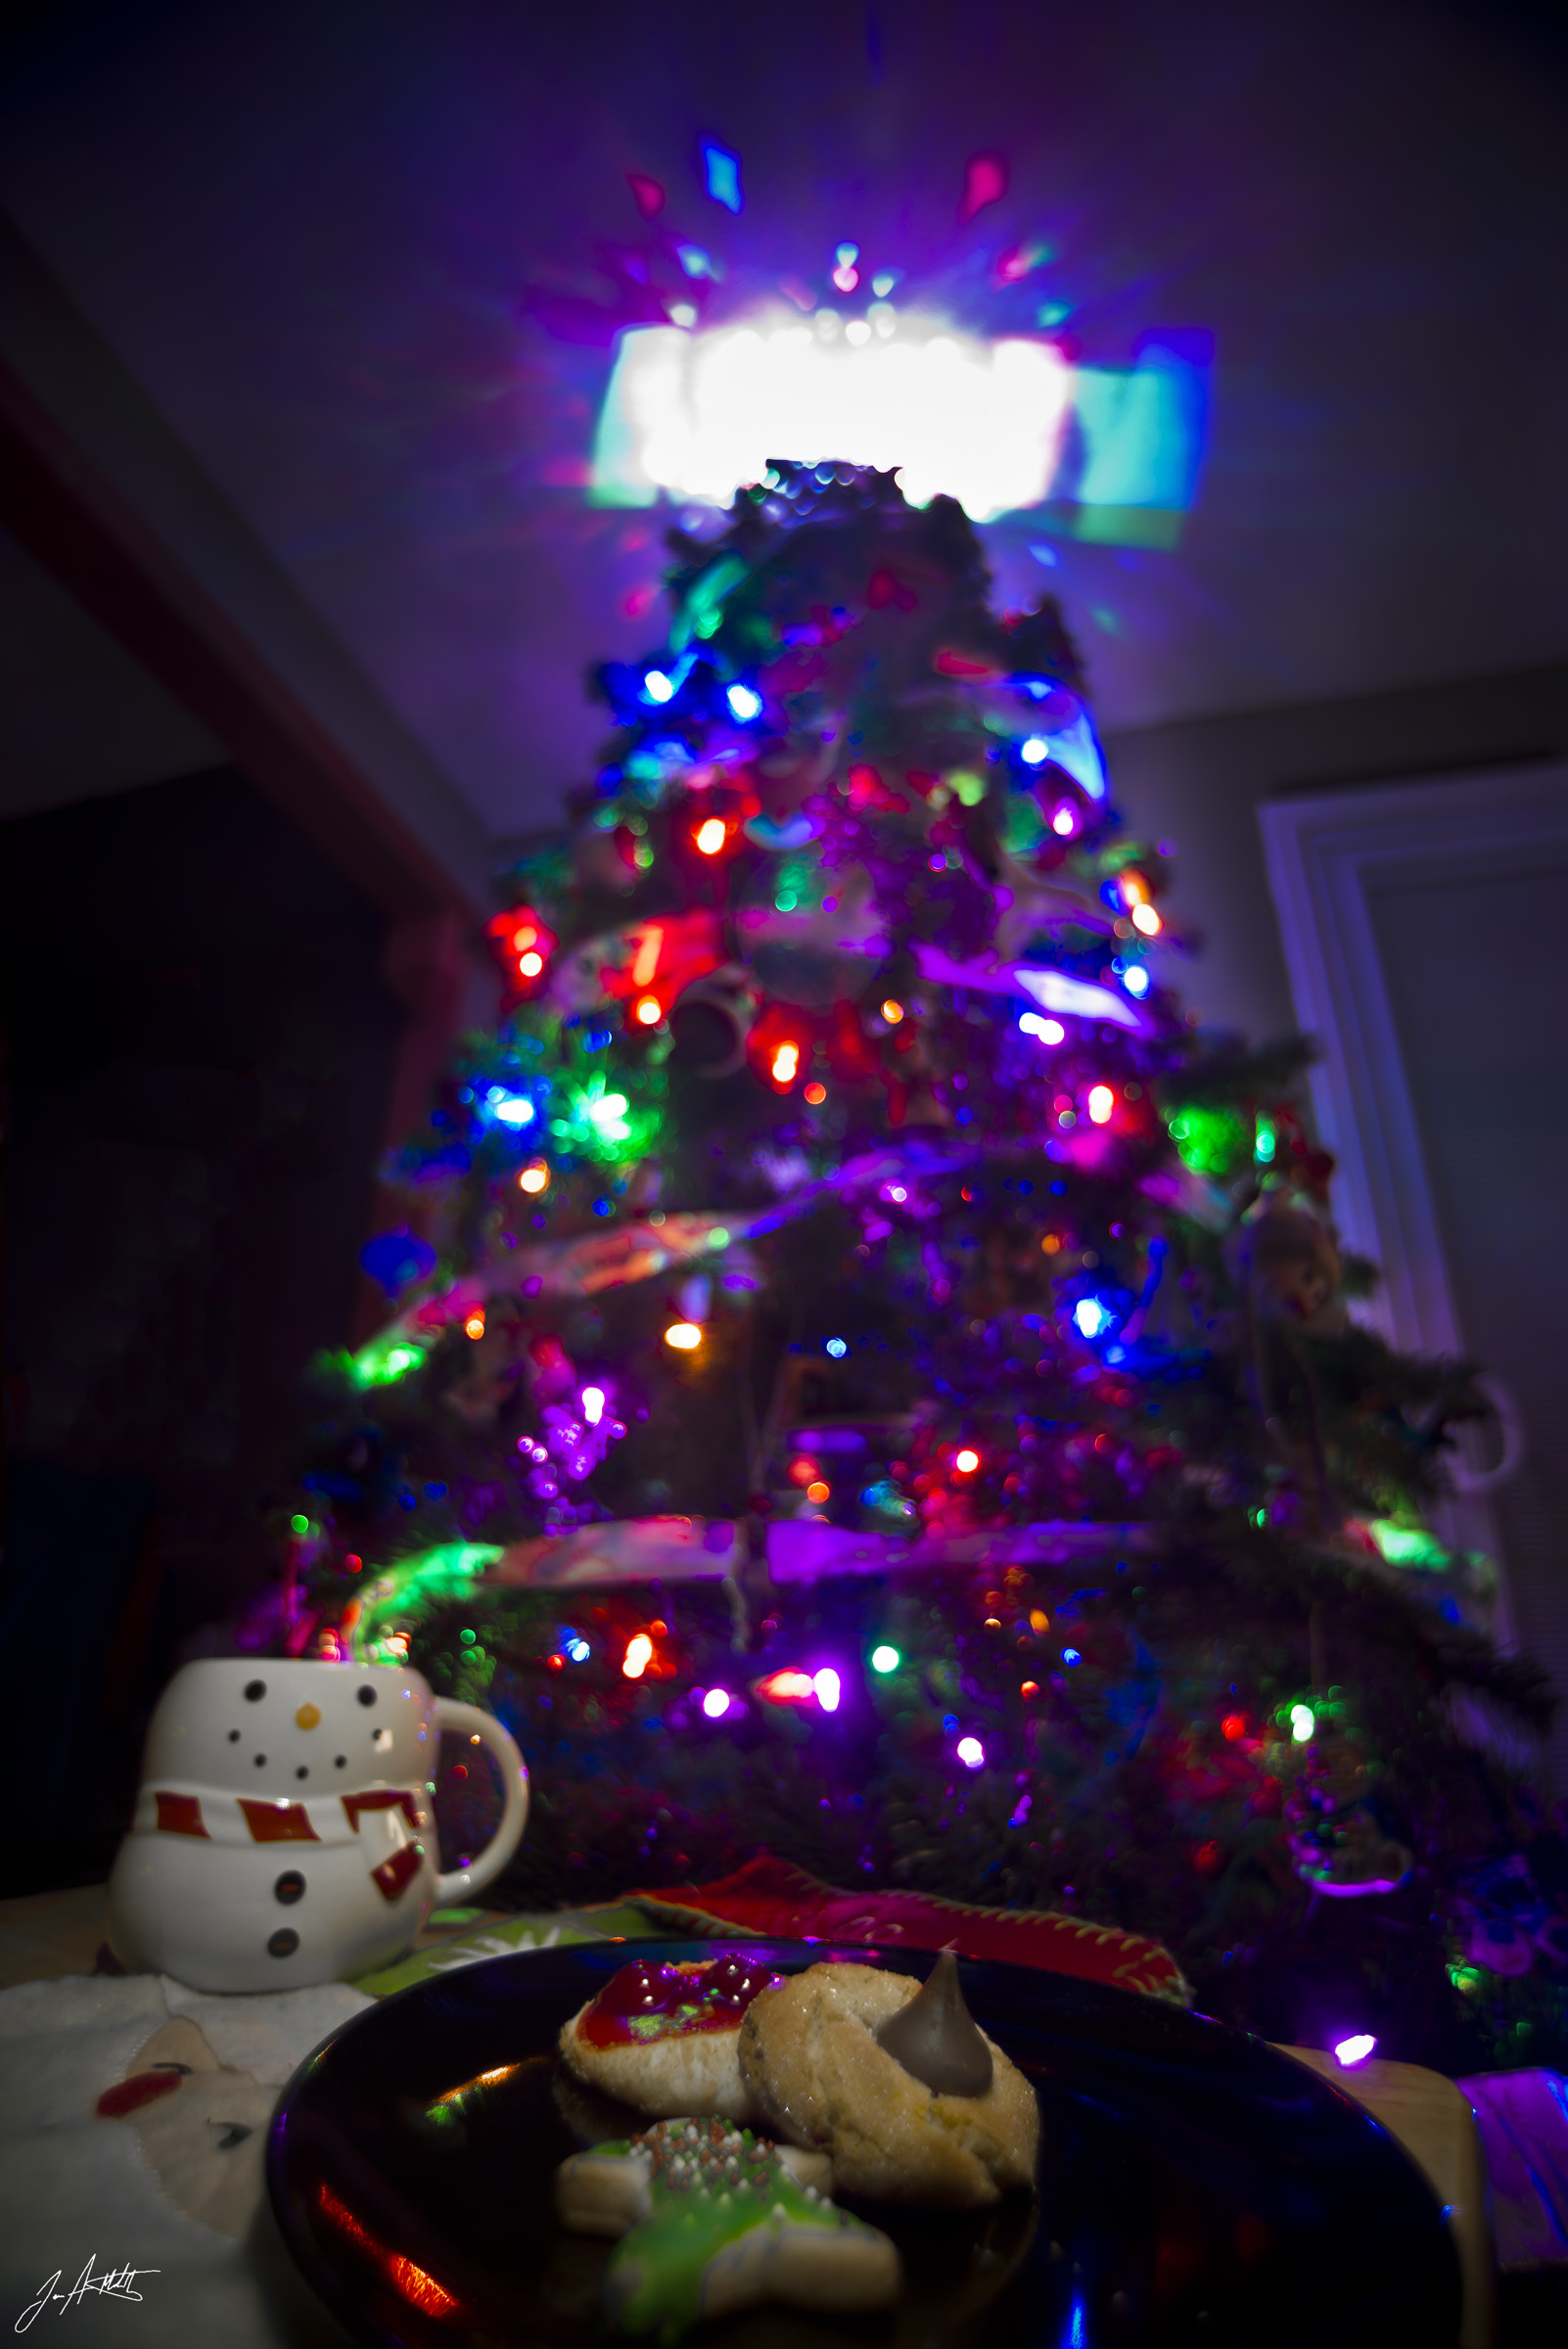 Day358_Cookies for Santa_December24